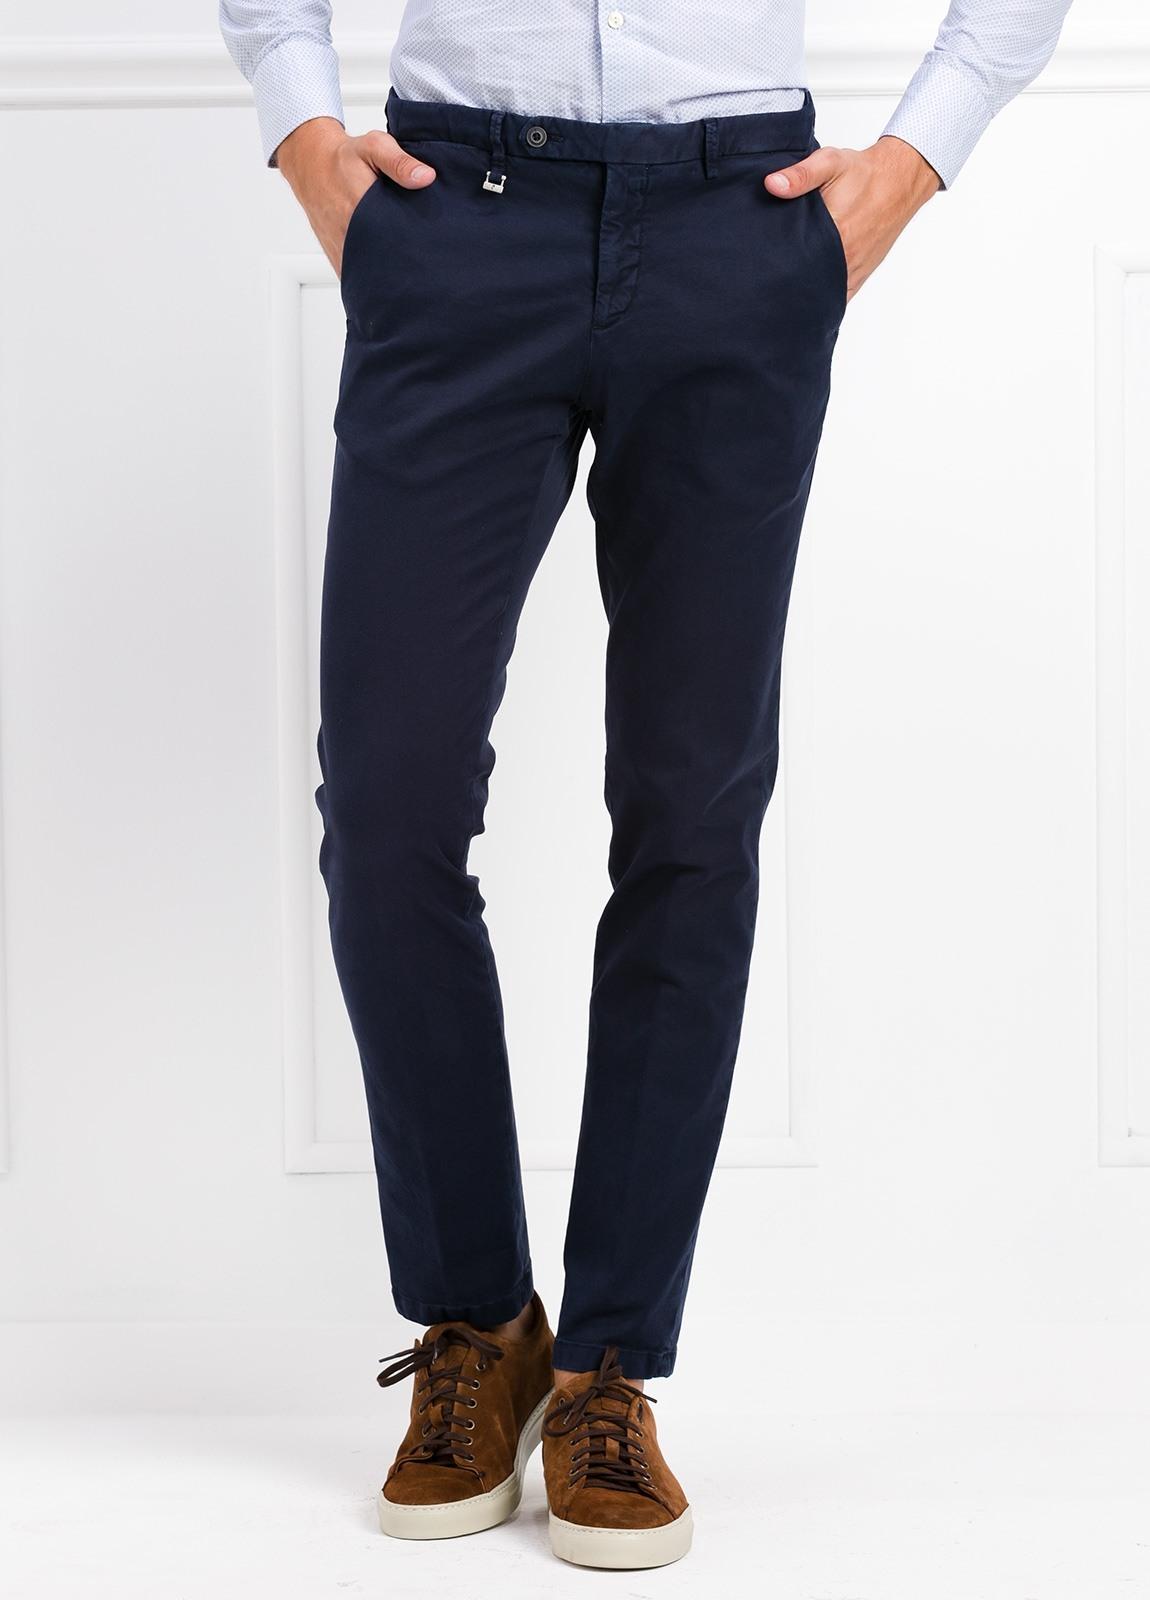 Pantalón modelo slim fit color azul marino. 97% Algodón 3% Ea.